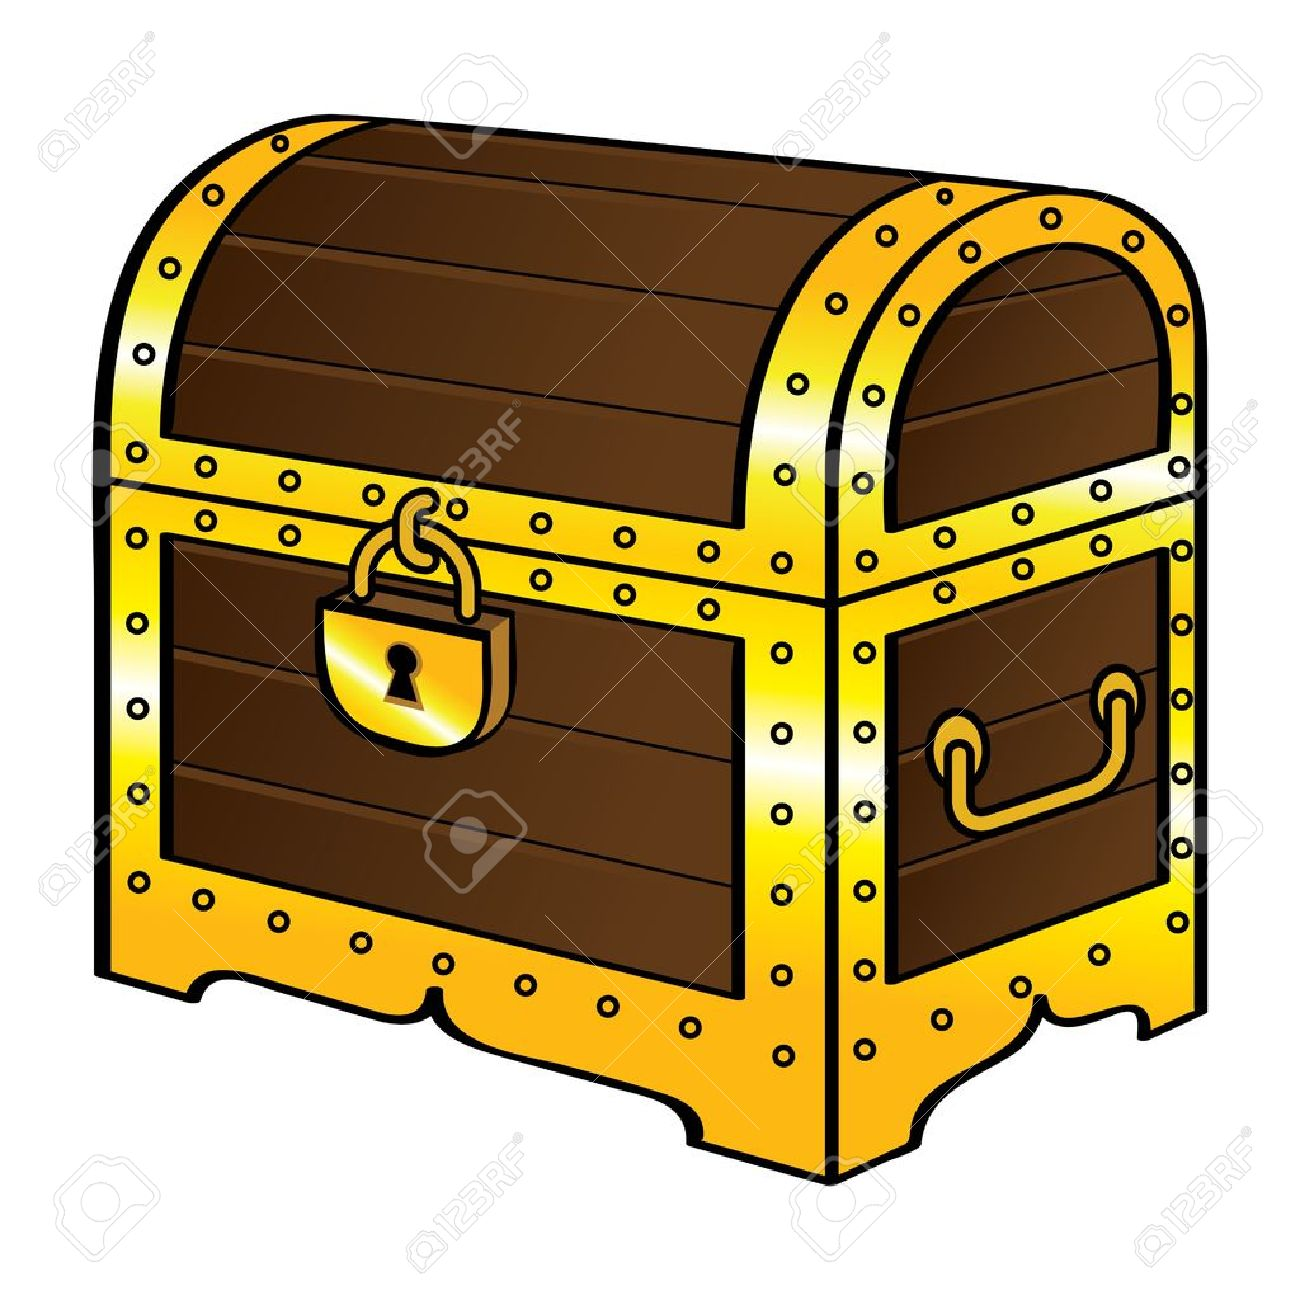 trunk chest gold treasure wood old vintage pirate lock royalty free rh 123rf com wooden treasure chest clipart free wooden treasure chest clipart free